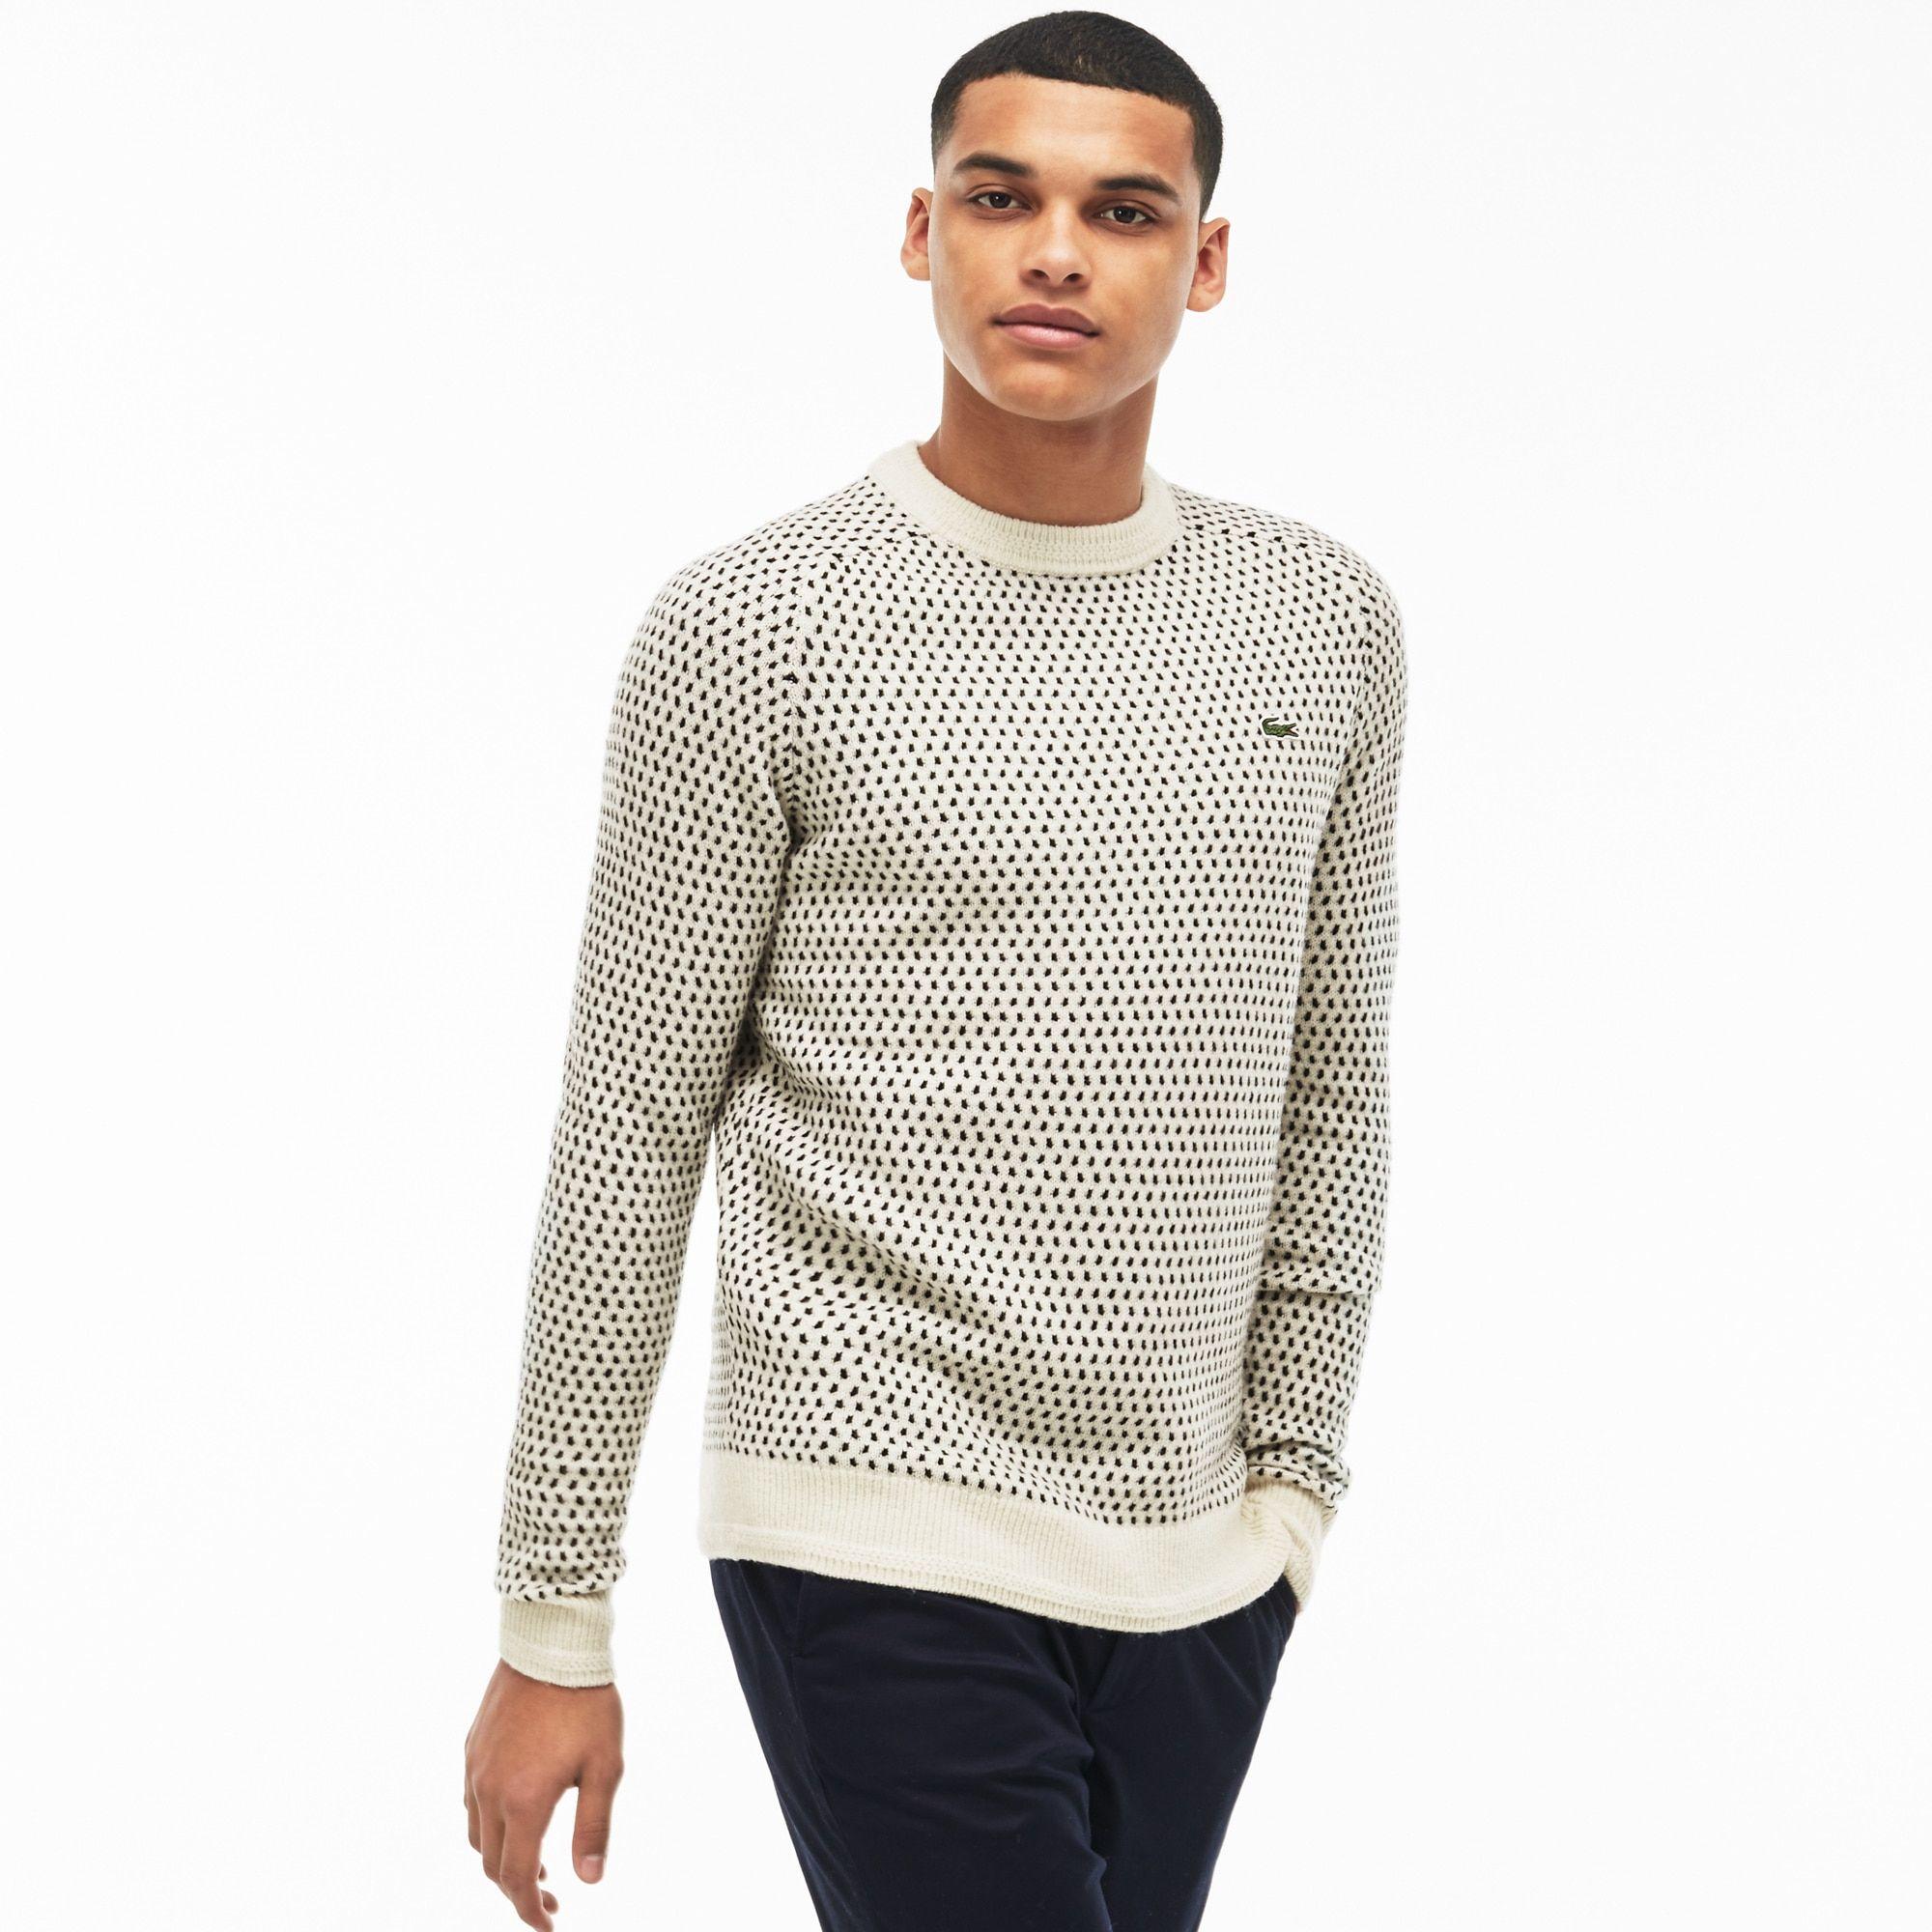 b897cfd213 Men's LIVE Crew Neck Wool Blend Mini Jacquard Sweater | LACOSTE ...